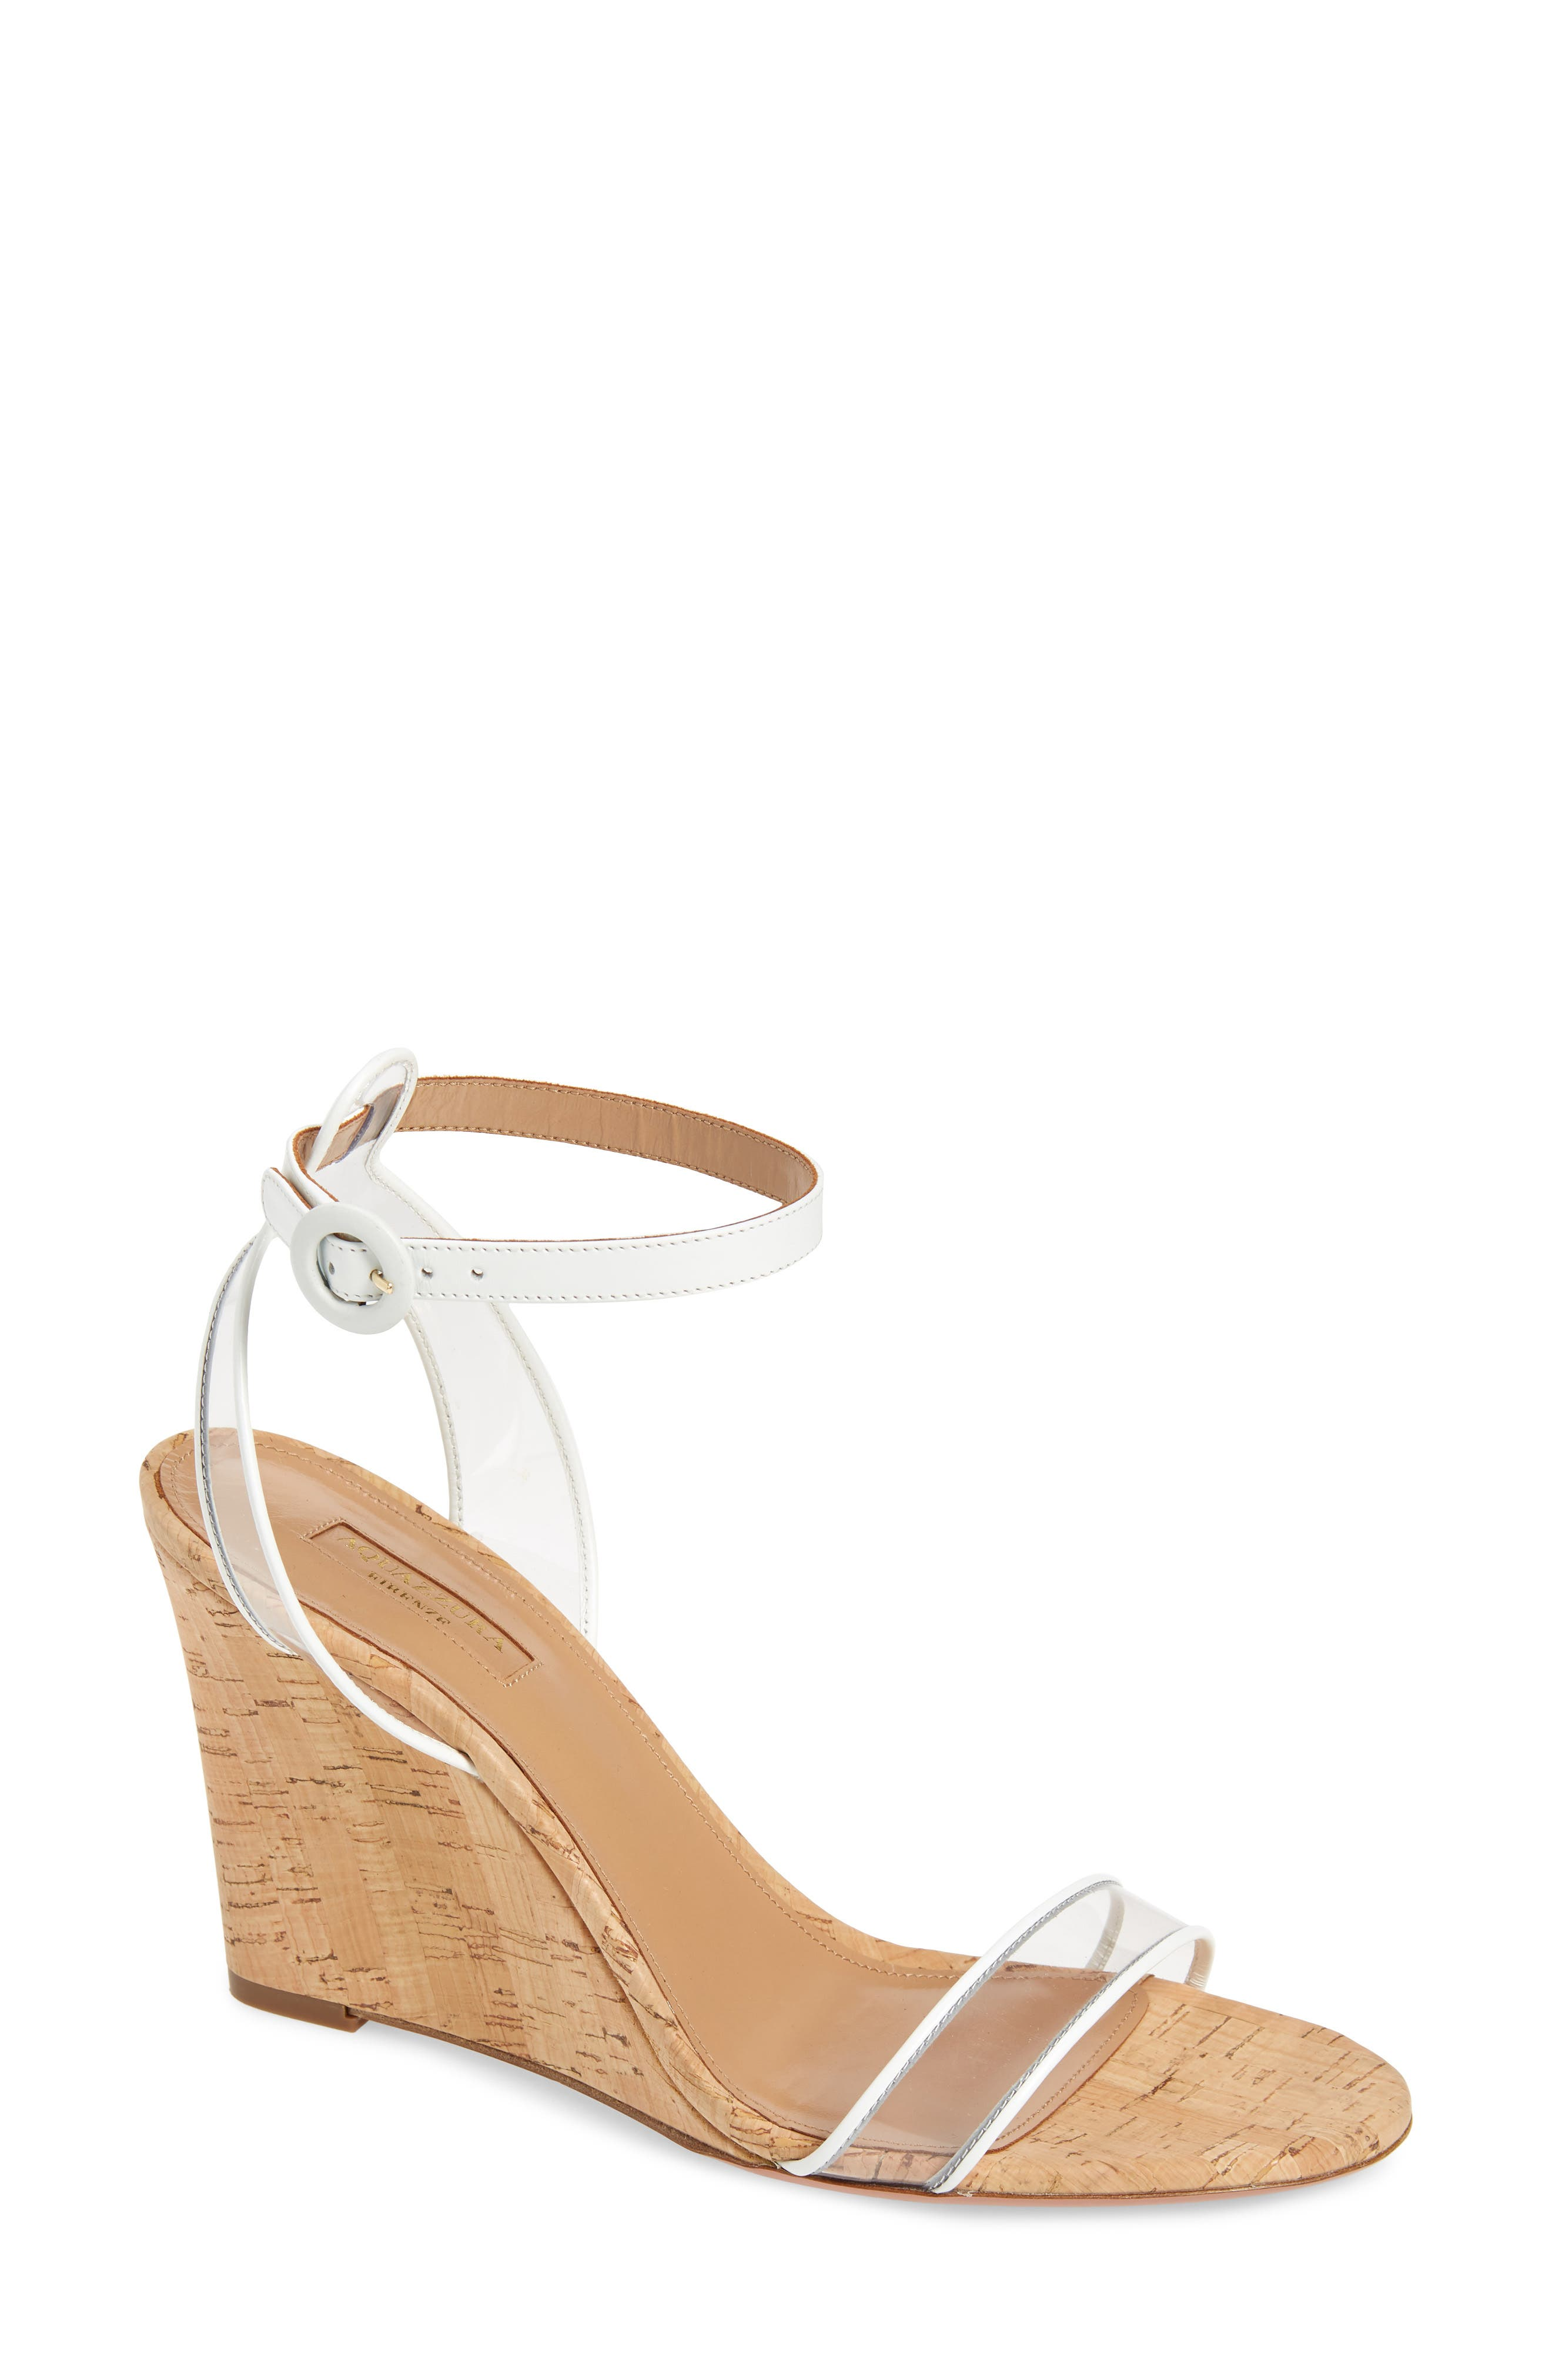 Aquazzura Slippers Minimalist Ankle Strap Wedge